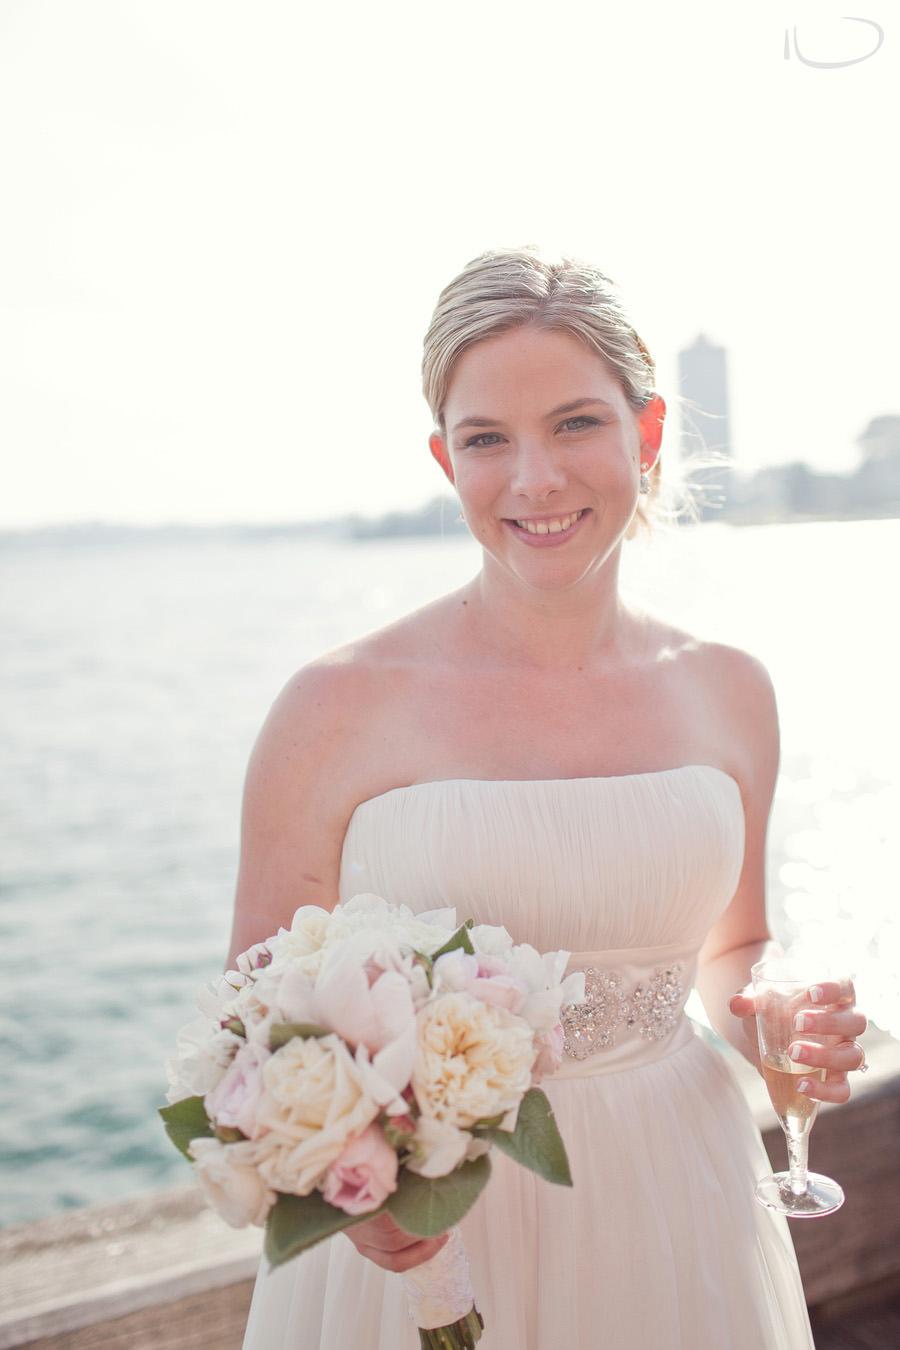 Milsons Point Wedding Photographer: Bridal portrait